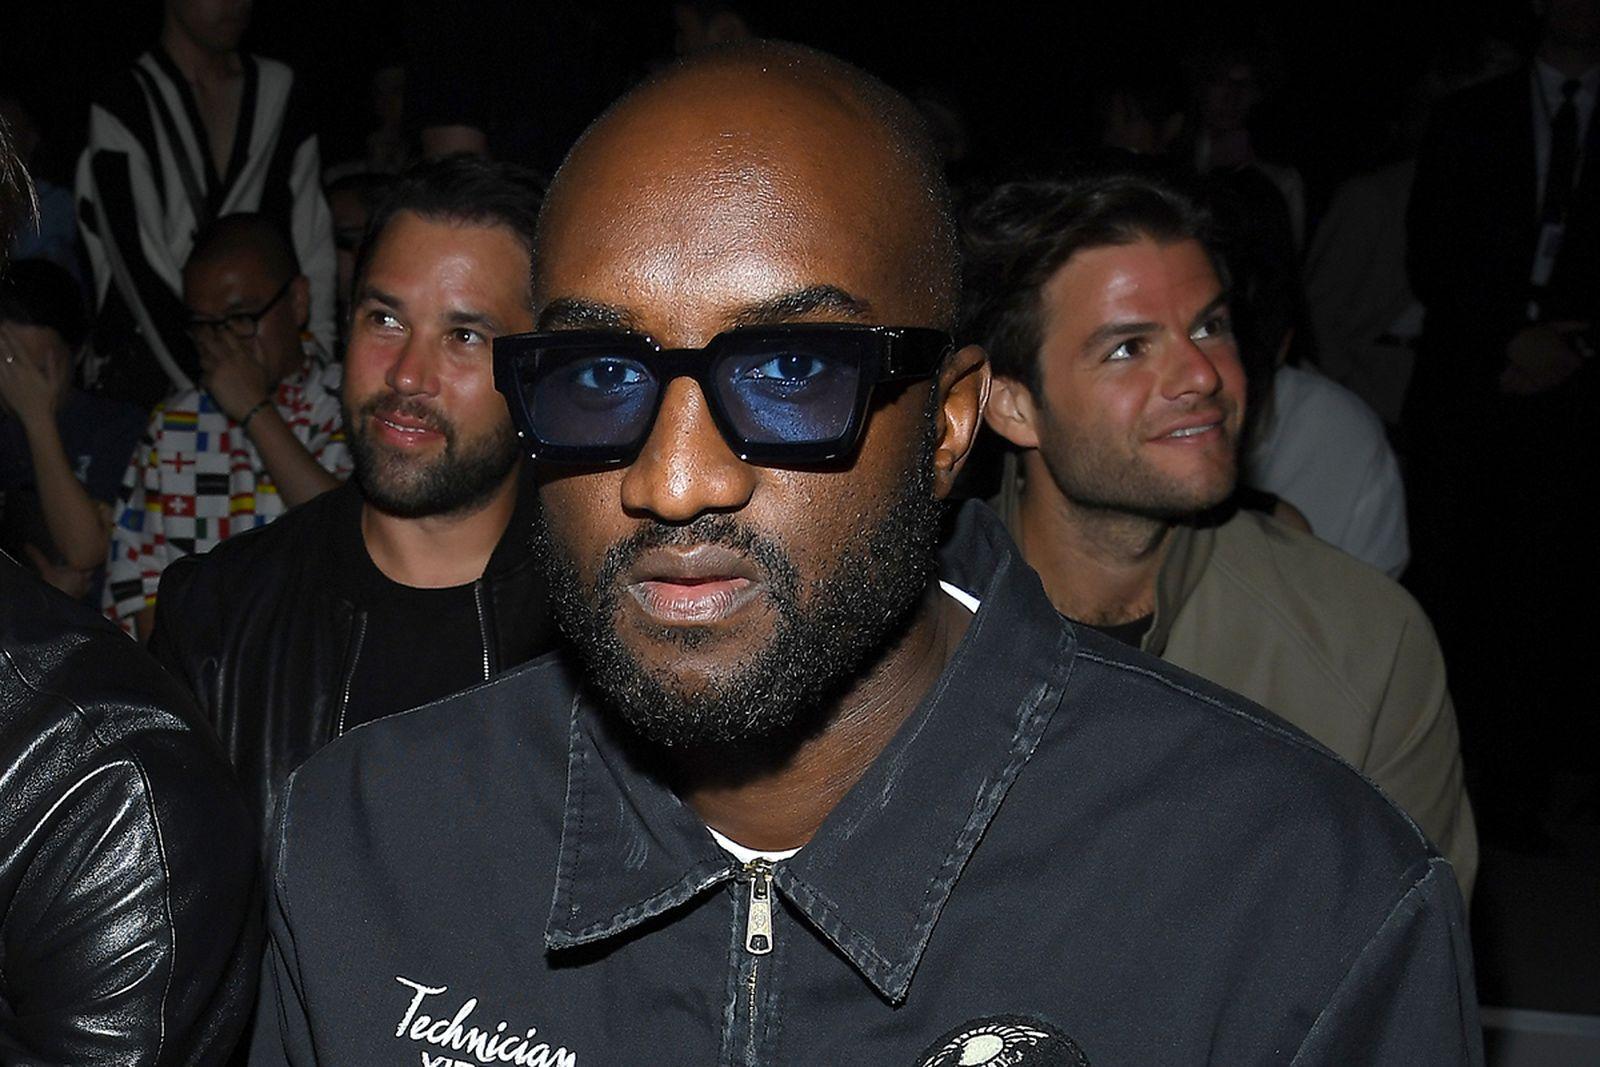 Virgil Abloh Fashion Week Sitting Glasses